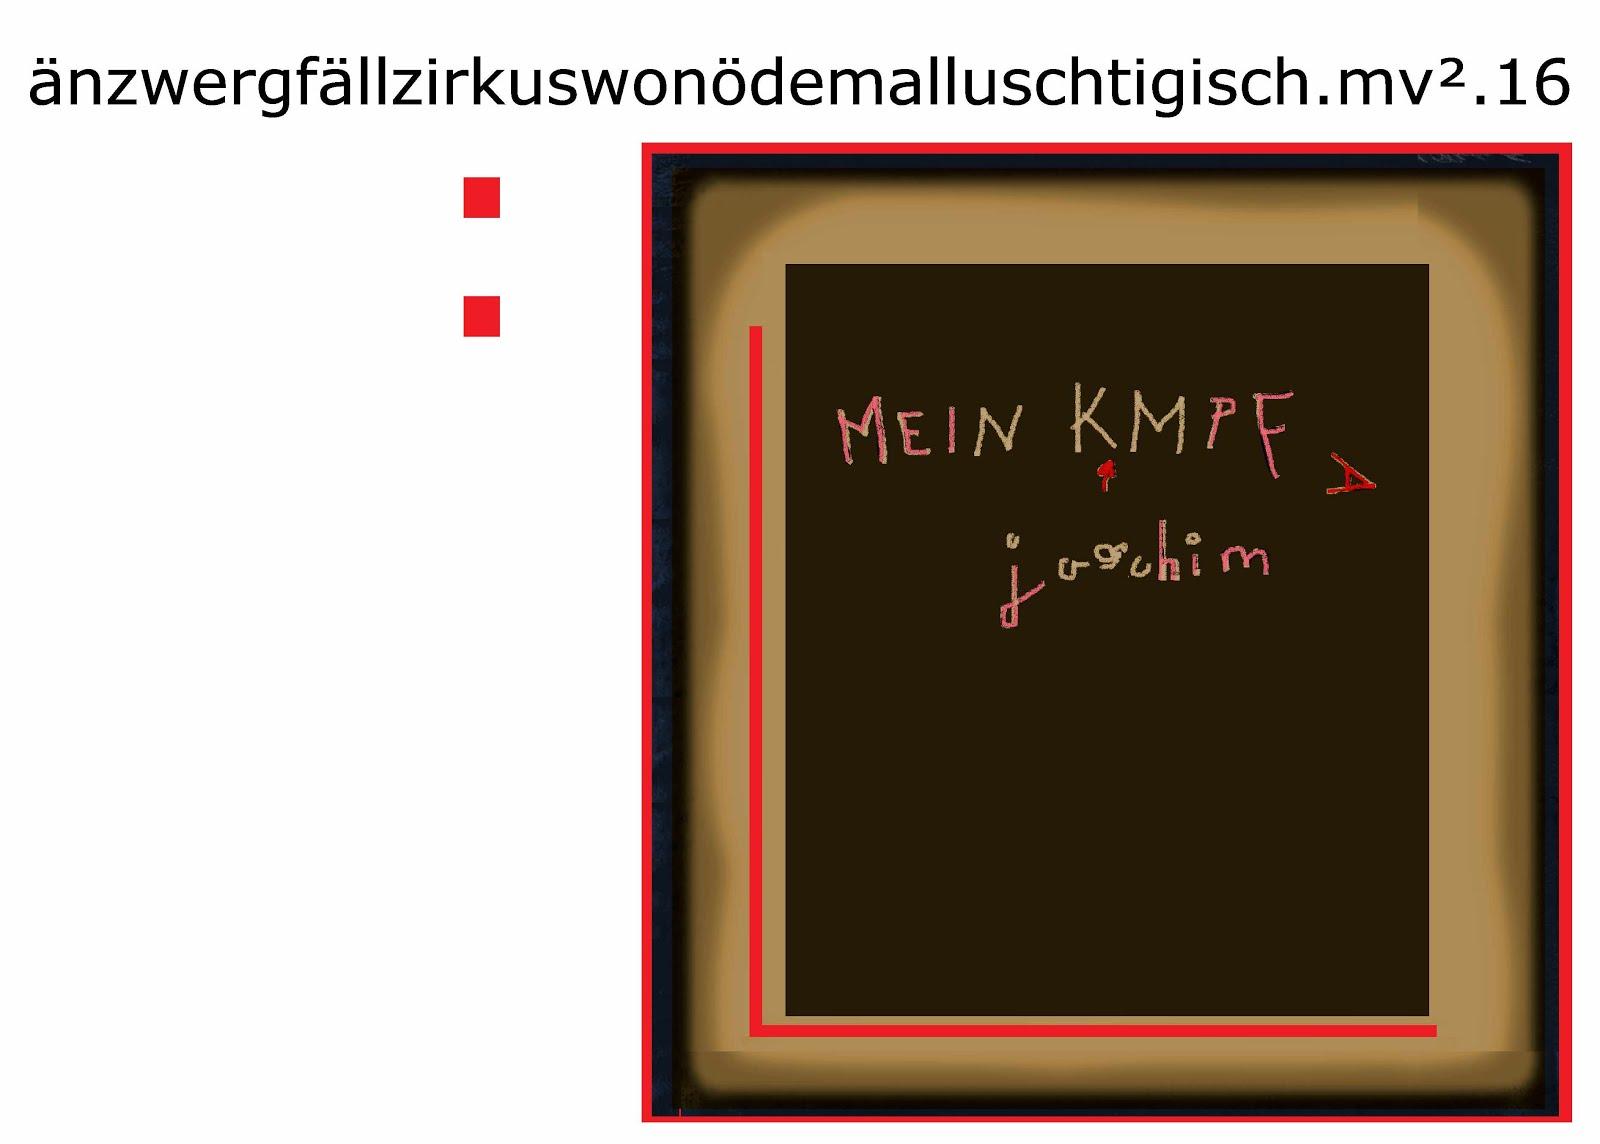 zentralbibliothek zürich handschriftenabteilung arch armin bollinger mischa vetere burkhalter séga